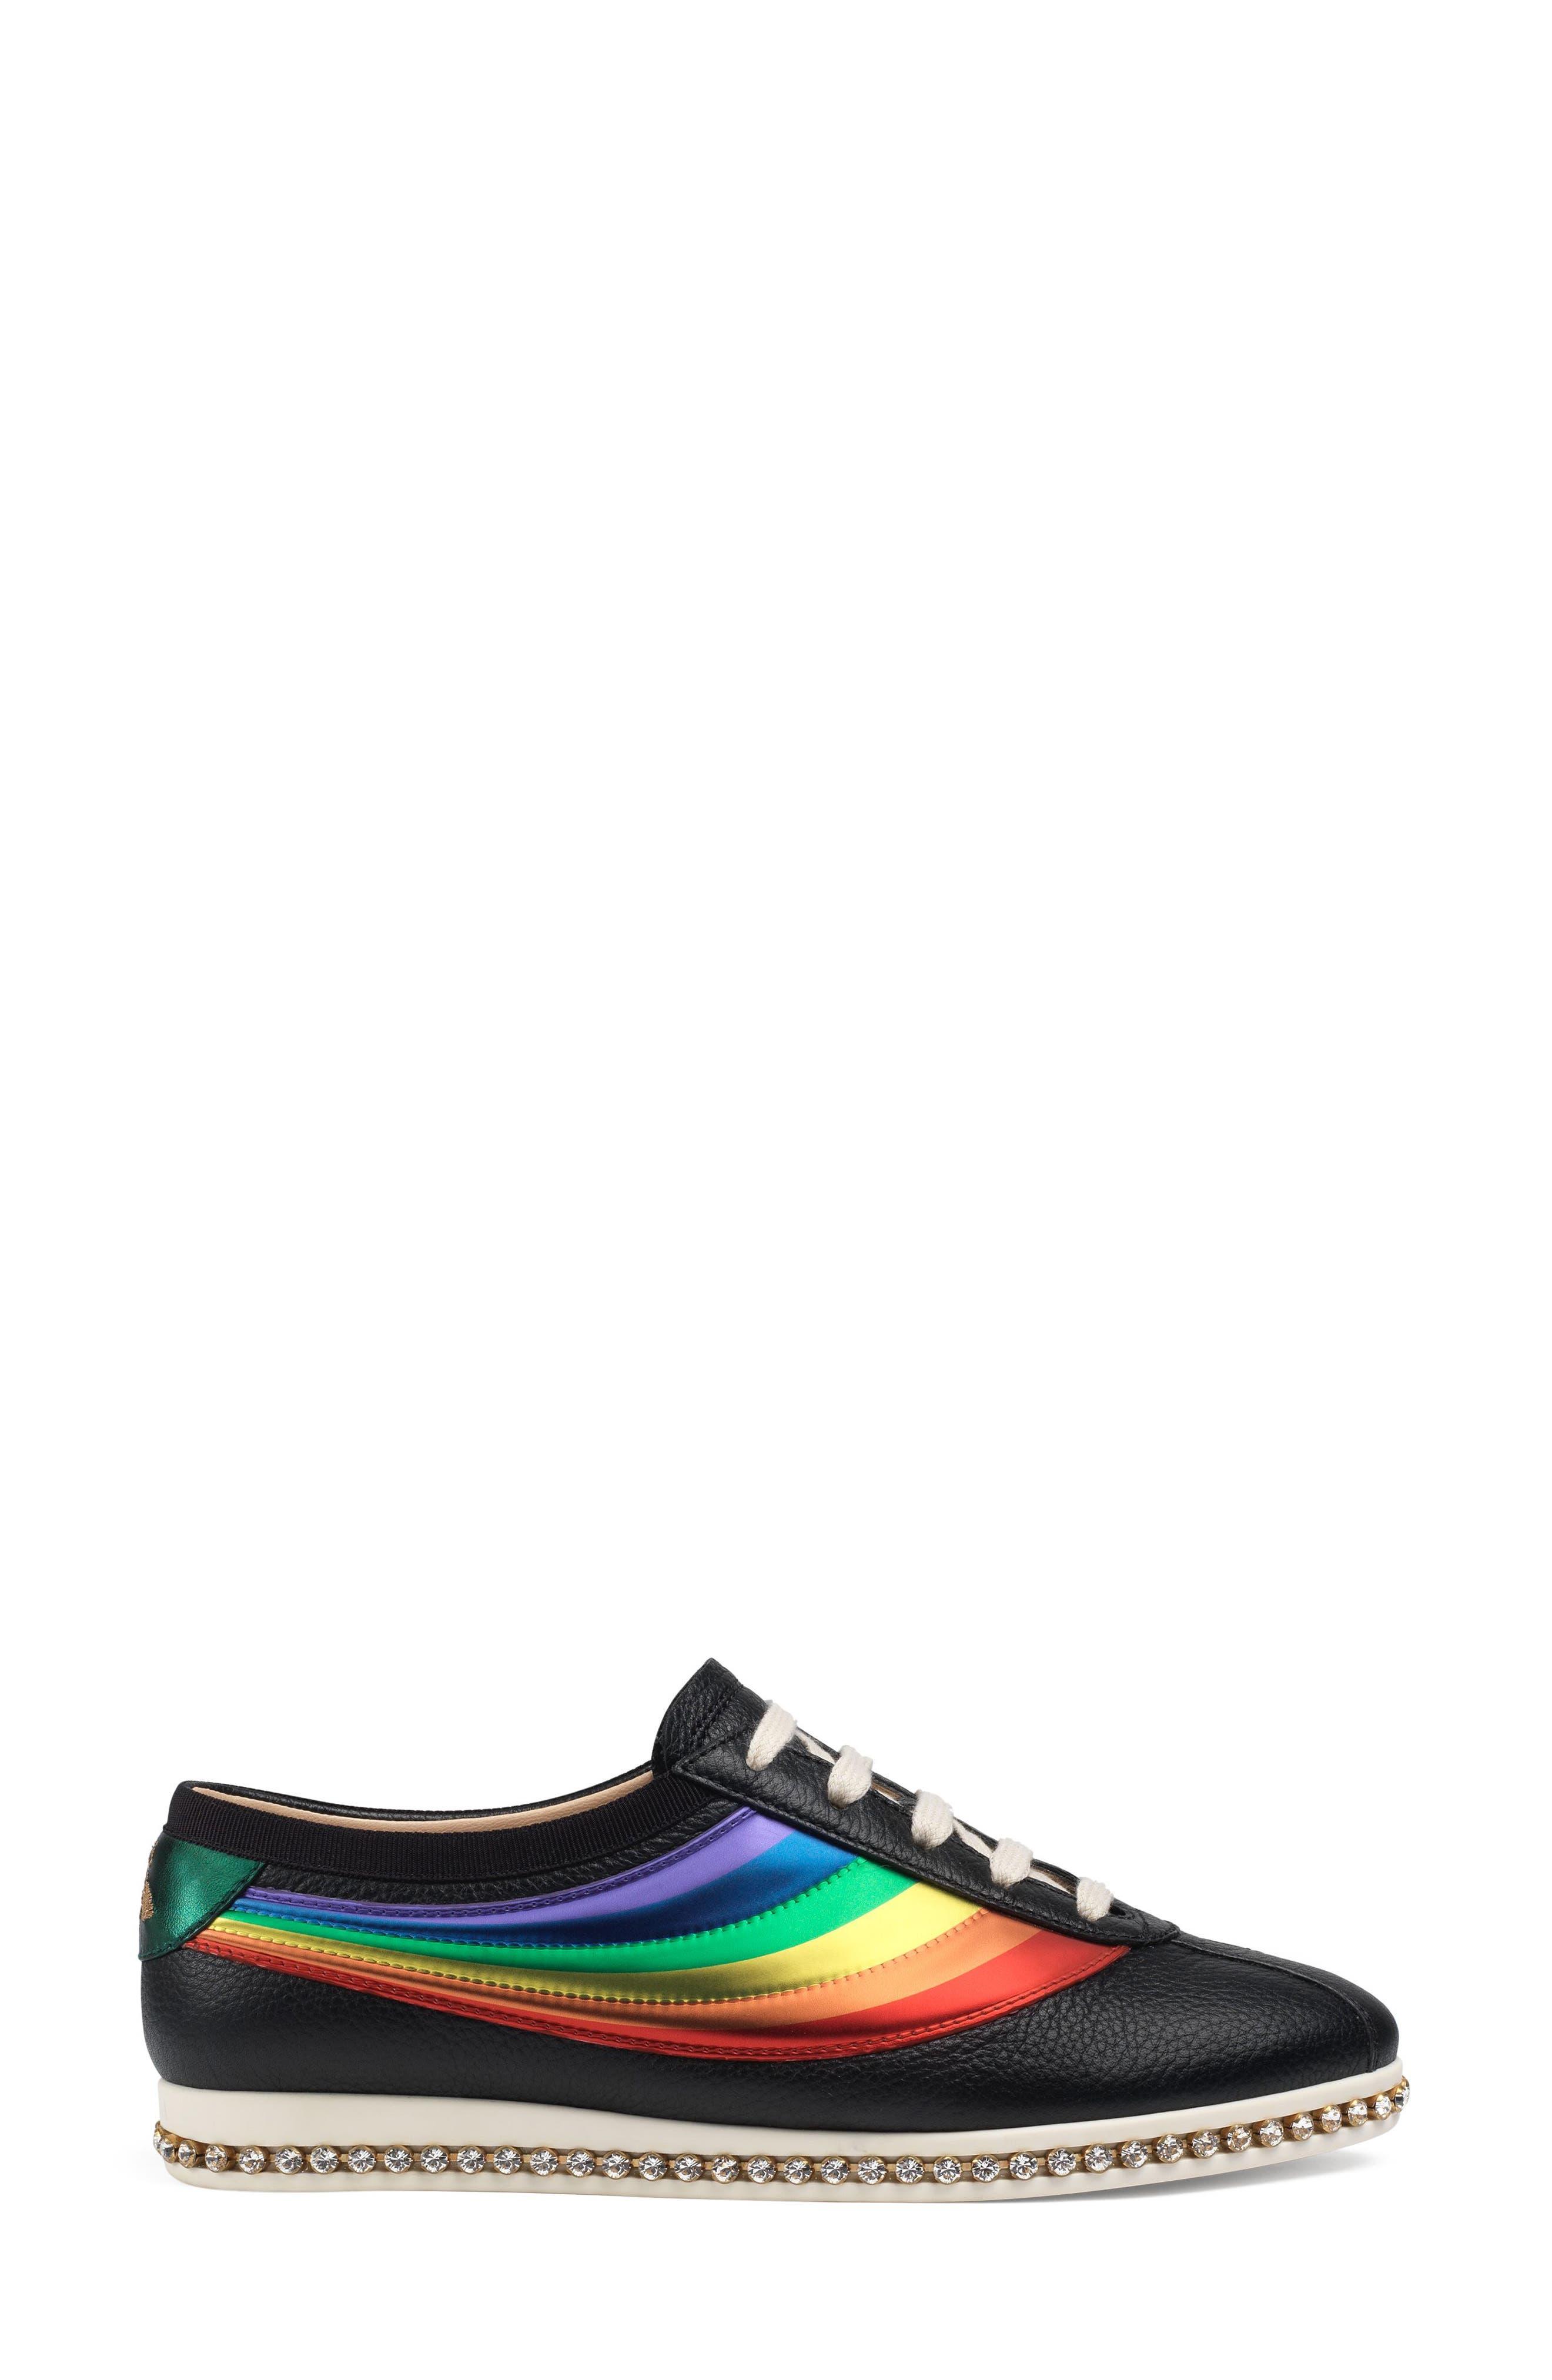 Falacer Sneaker,                             Alternate thumbnail 2, color,                             Black